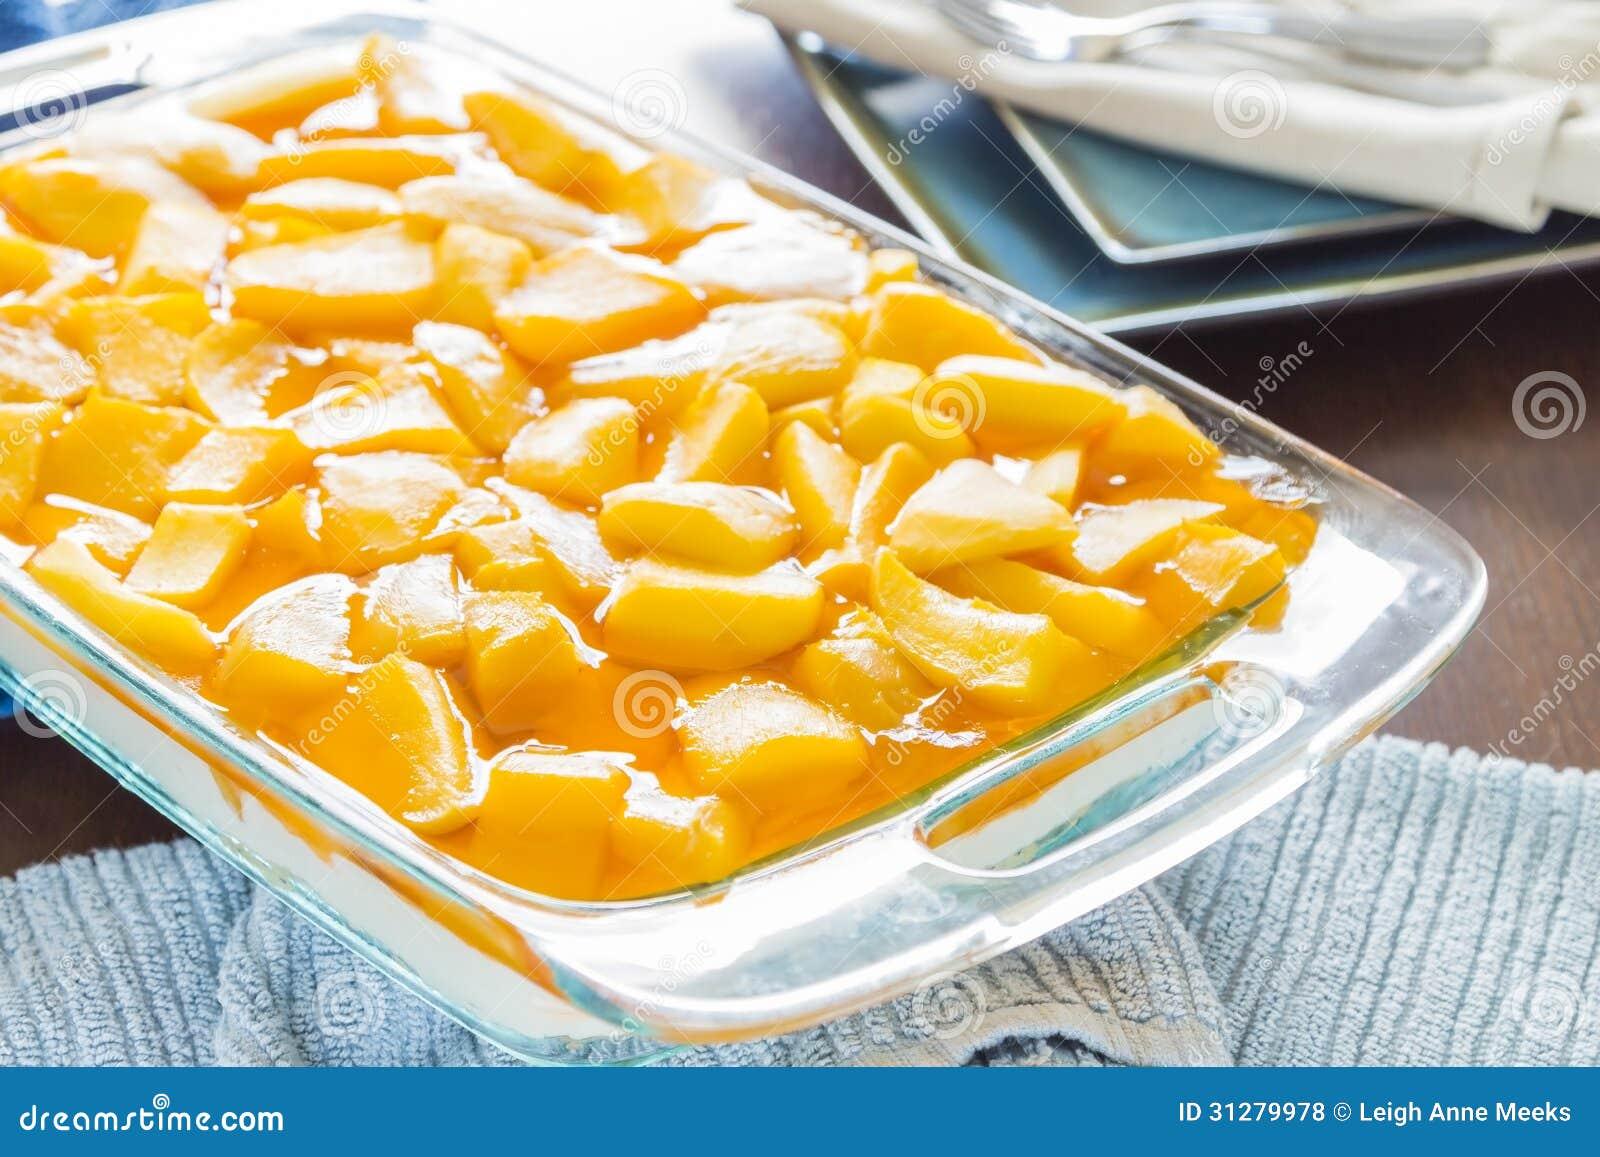 Hawaiian Mango Jello Cheesecake Stock Photo Image Of Sweet